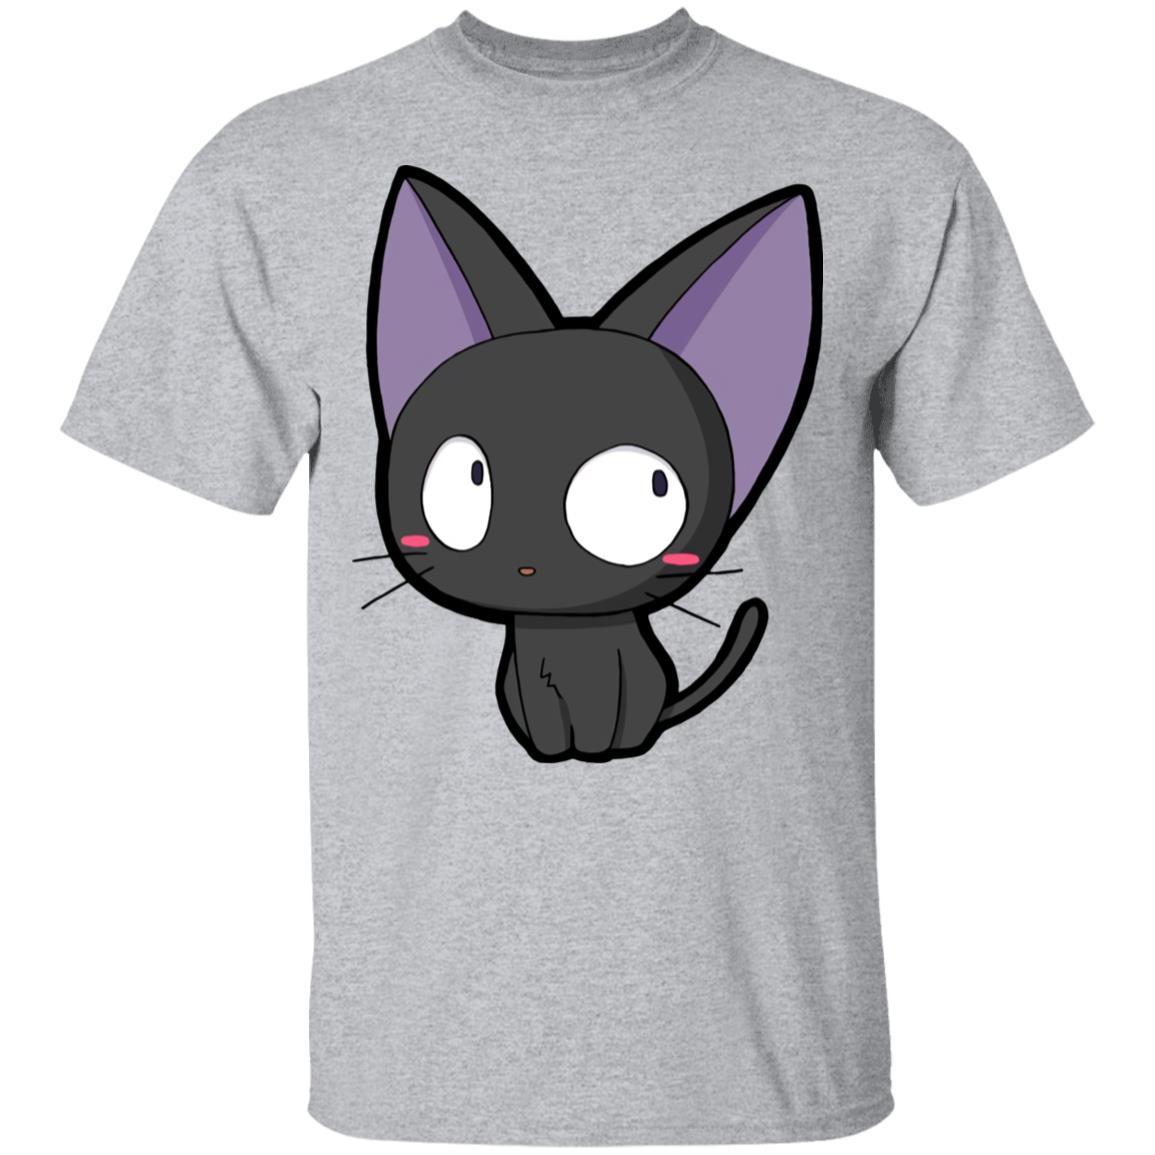 Kiki's Delivery Service – Jiji Chibi T Shirt